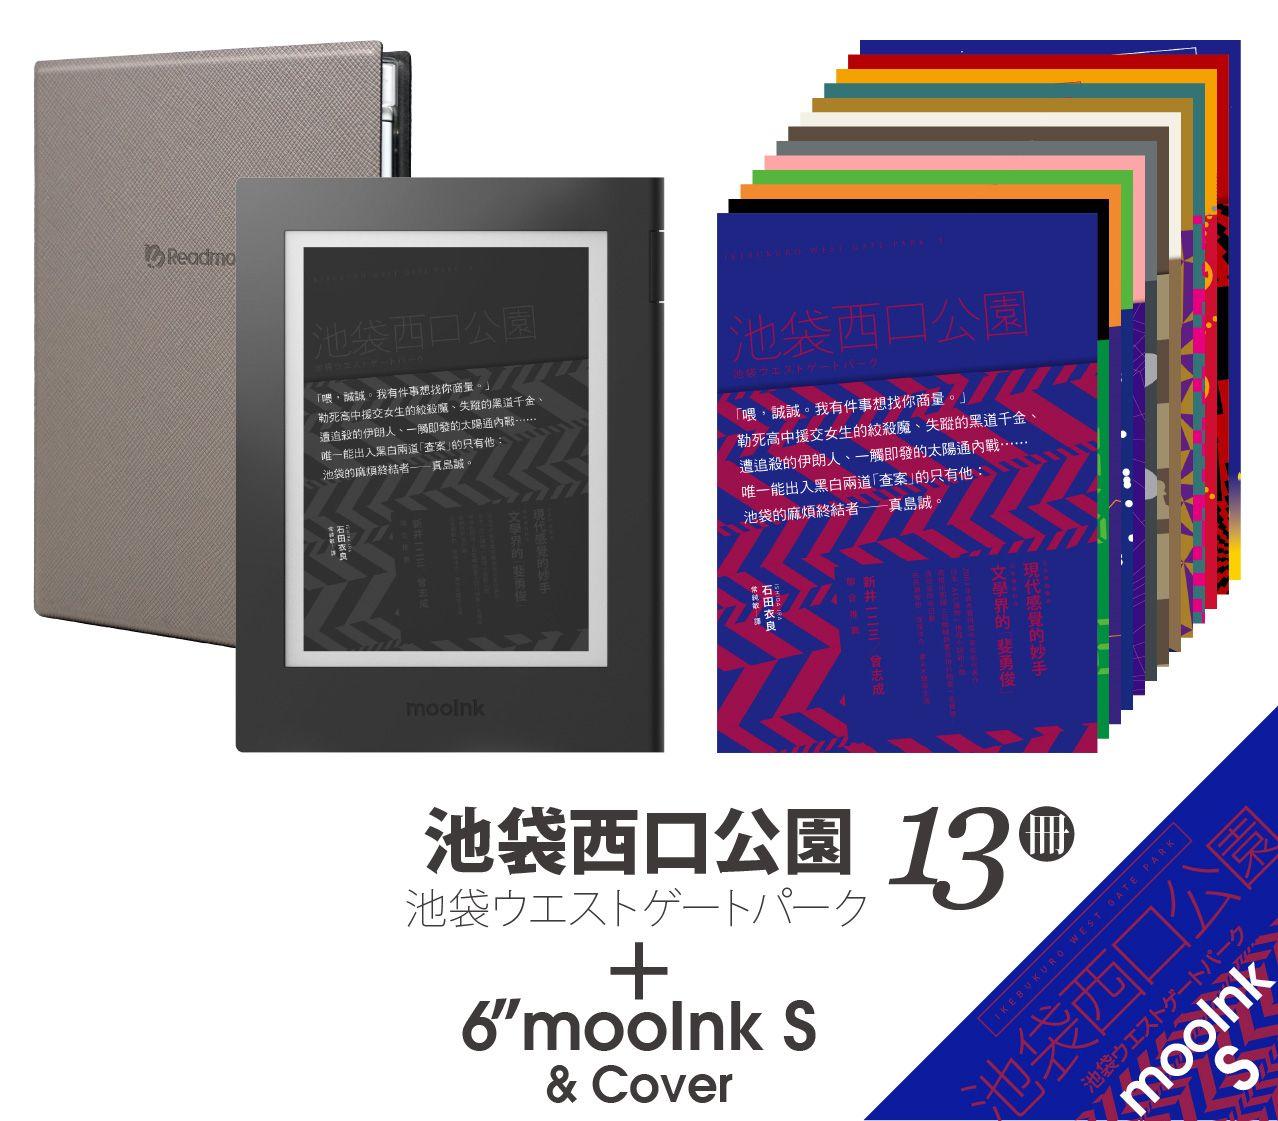 mooInk S (硯墨黑) + 保護殼 +《池袋西口公園系列 (13 冊)》套組